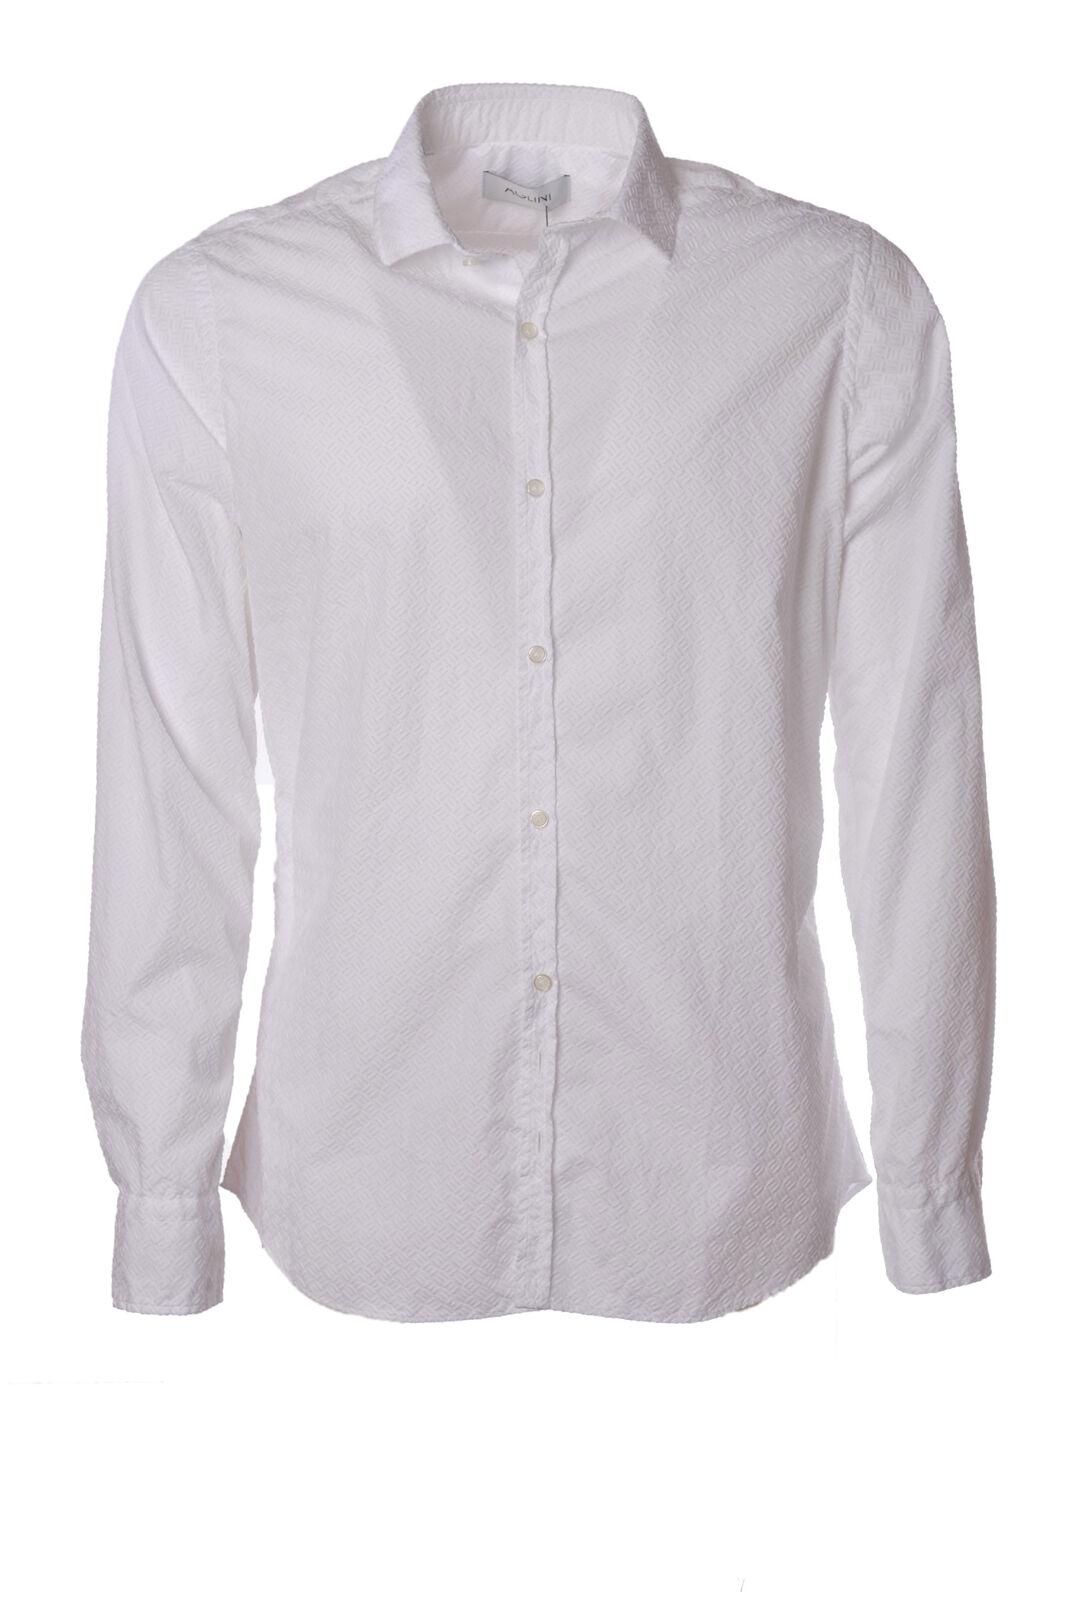 Aglini  -  Shirts - Male - Weiß - 2364125N174048